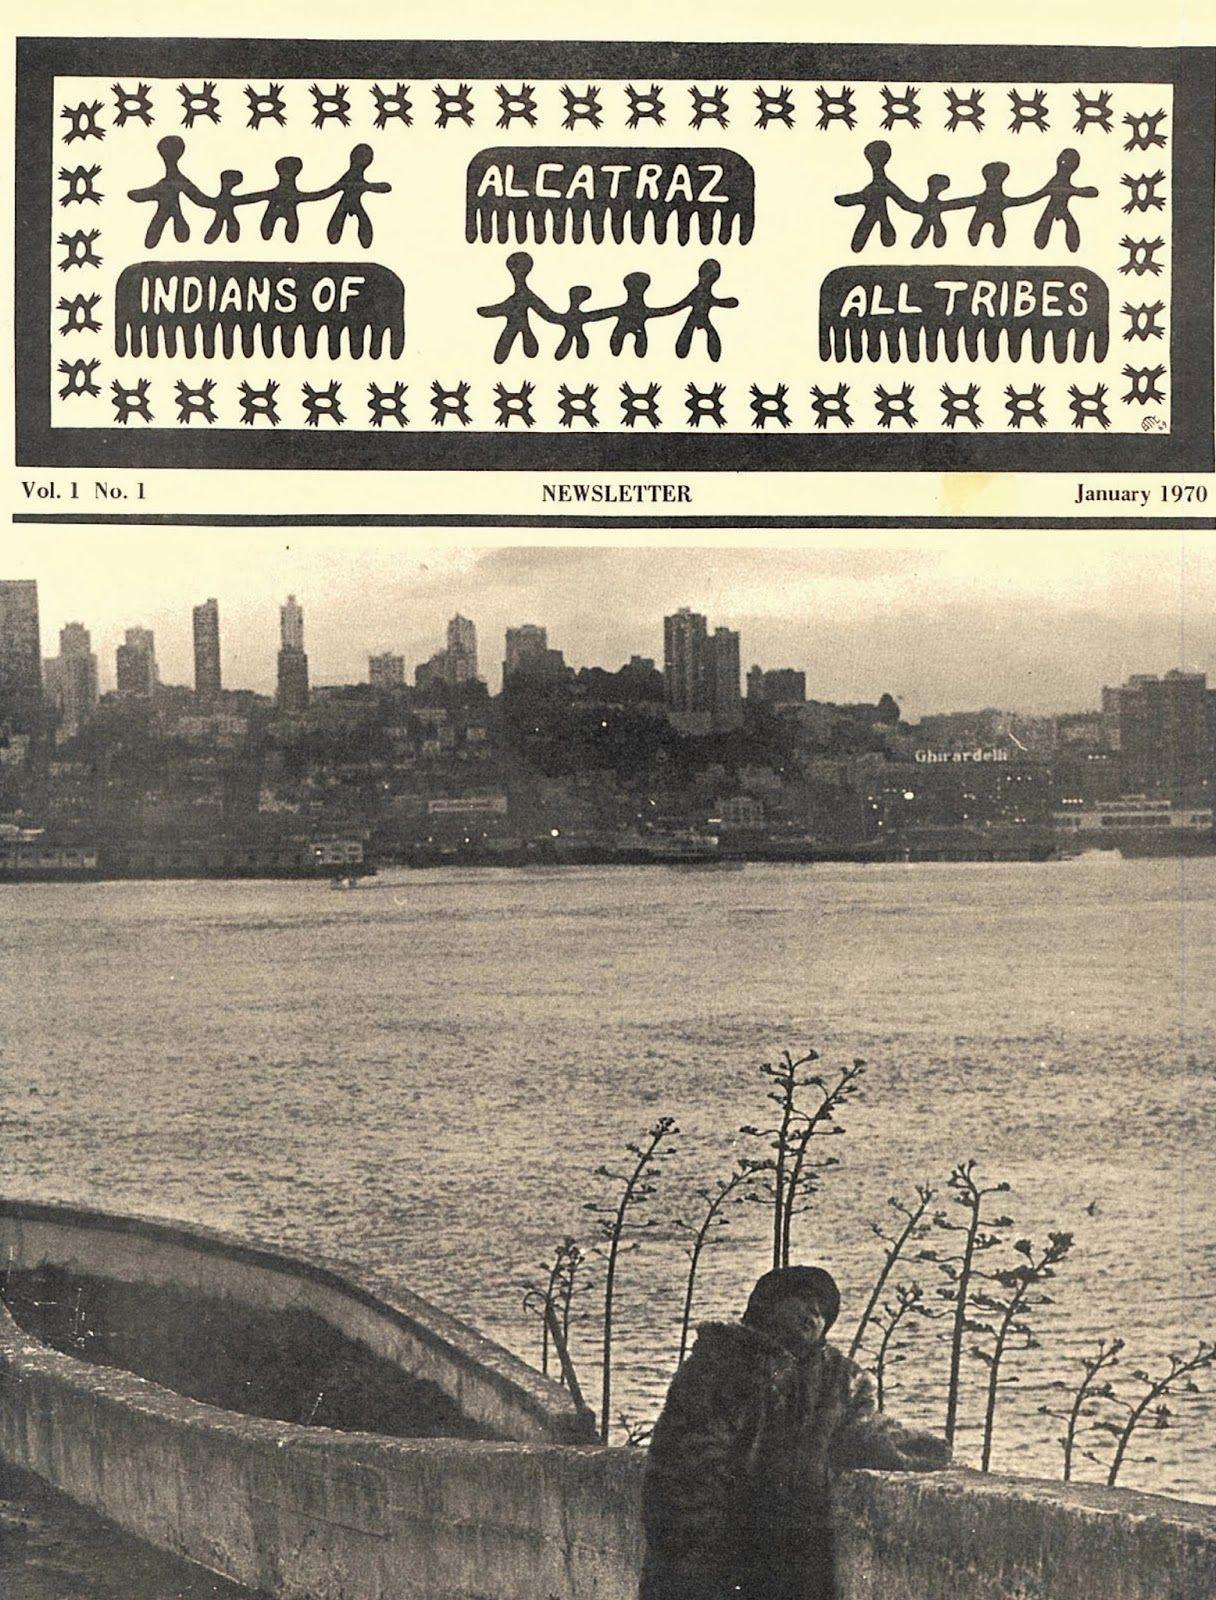 Occupation Newsletter Issue No 1 Alcatraz Family History